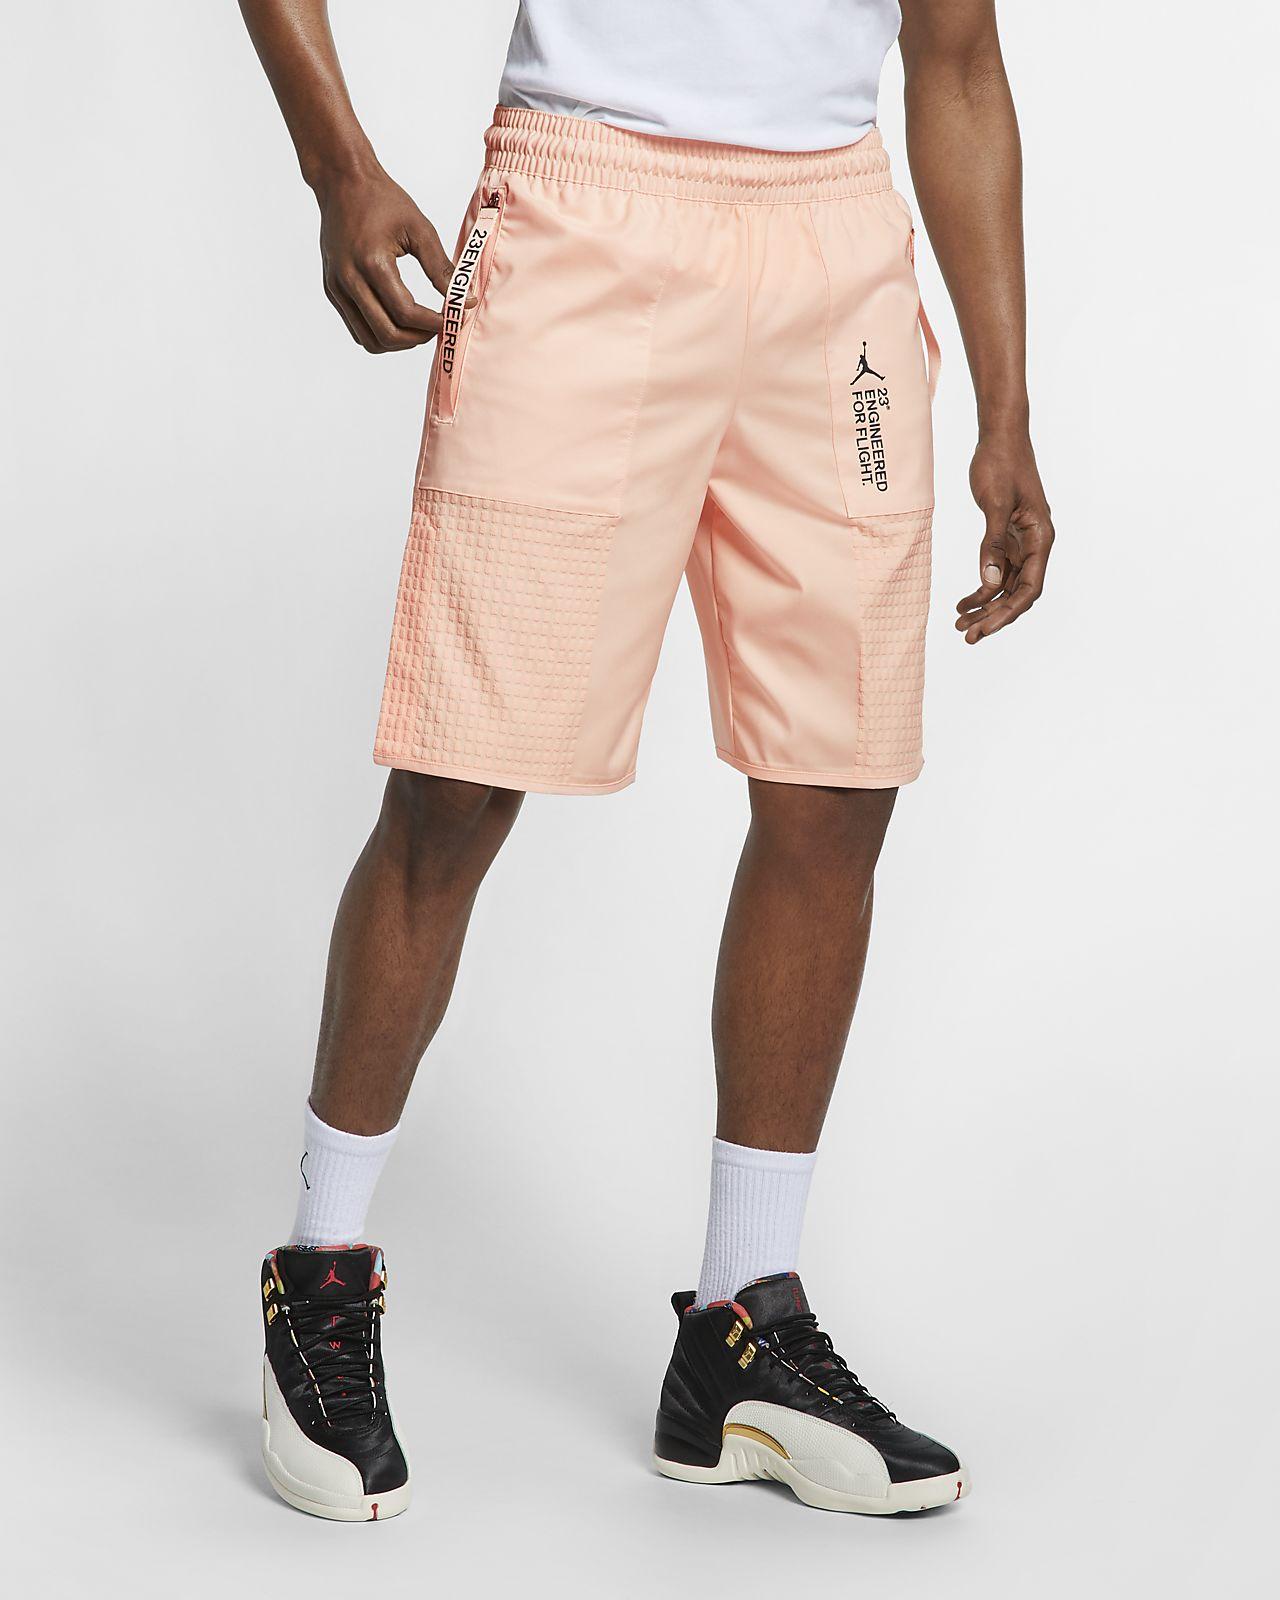 Jordan 23 Engineered 男子训练短裤